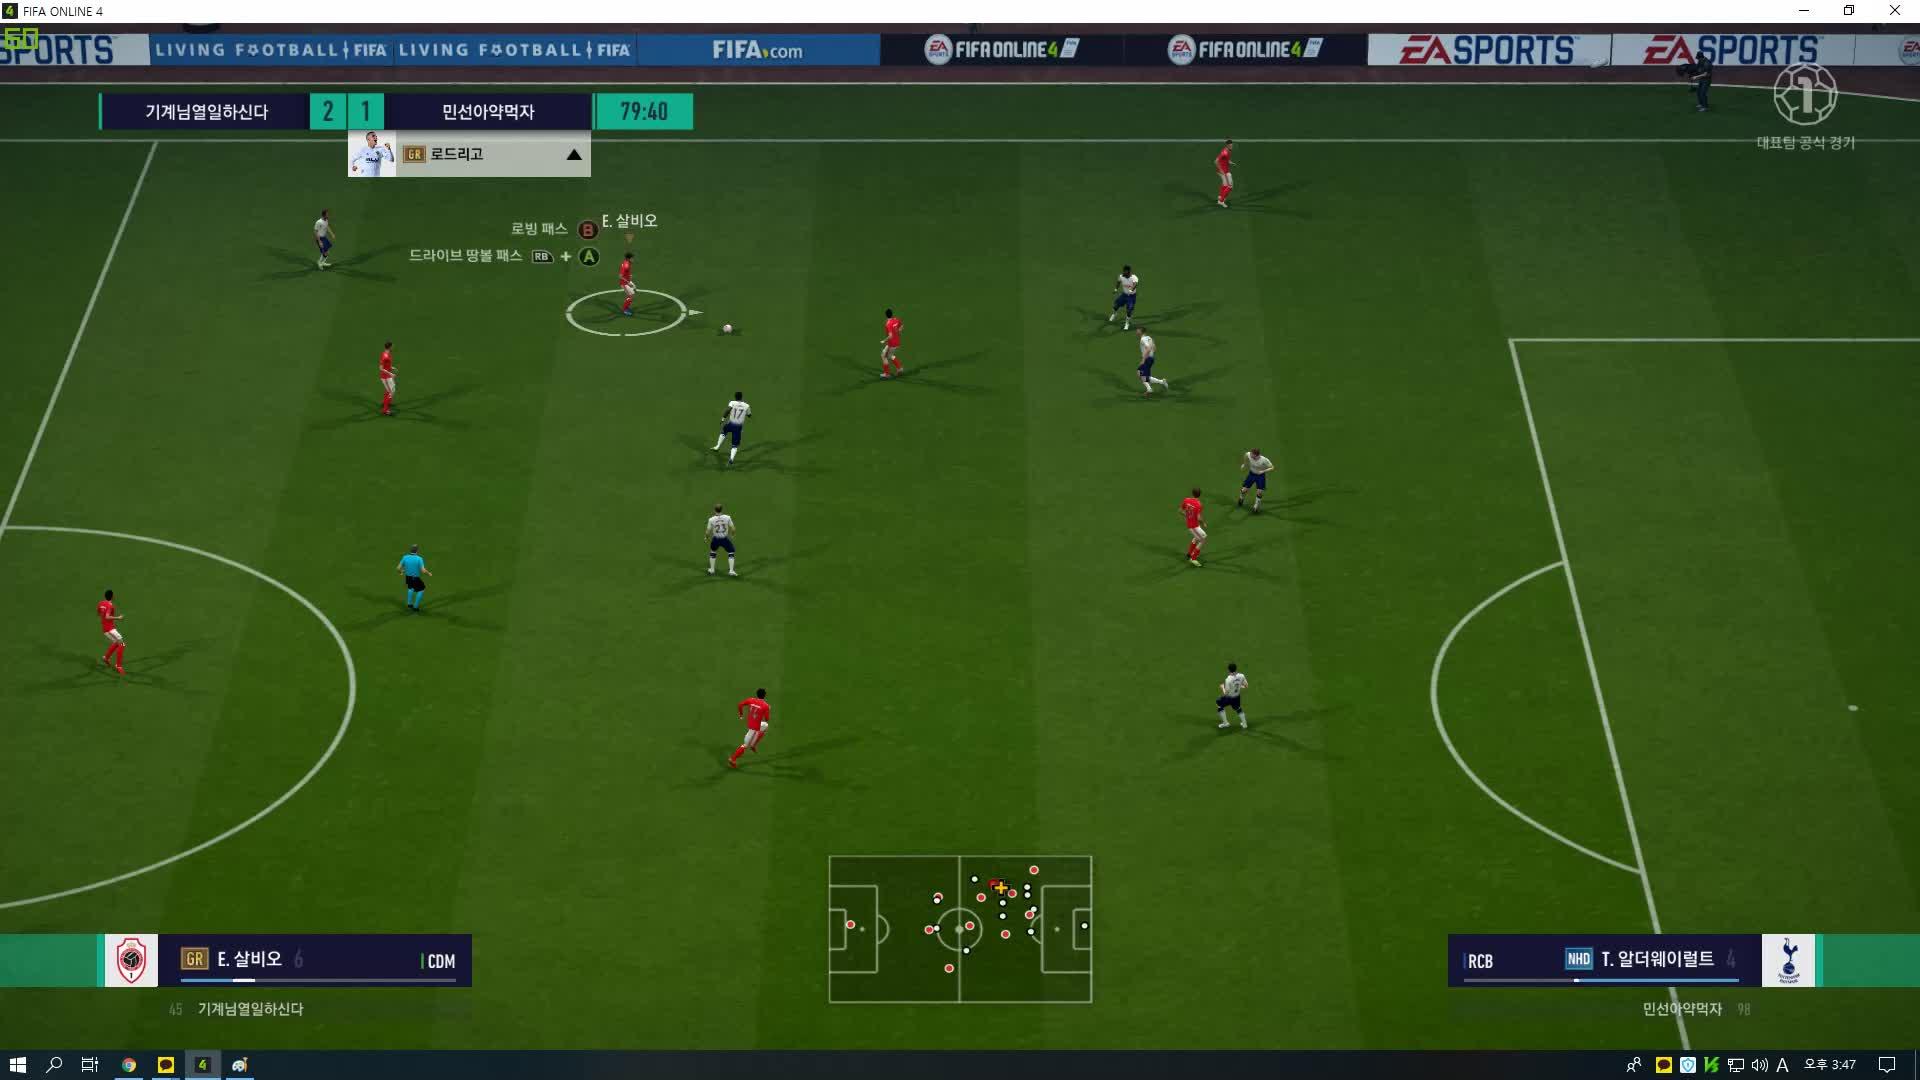 fifa, fifaonline4, FIFA Online 4 2019.04.23 - 15.47.31.02.DVR GIFs